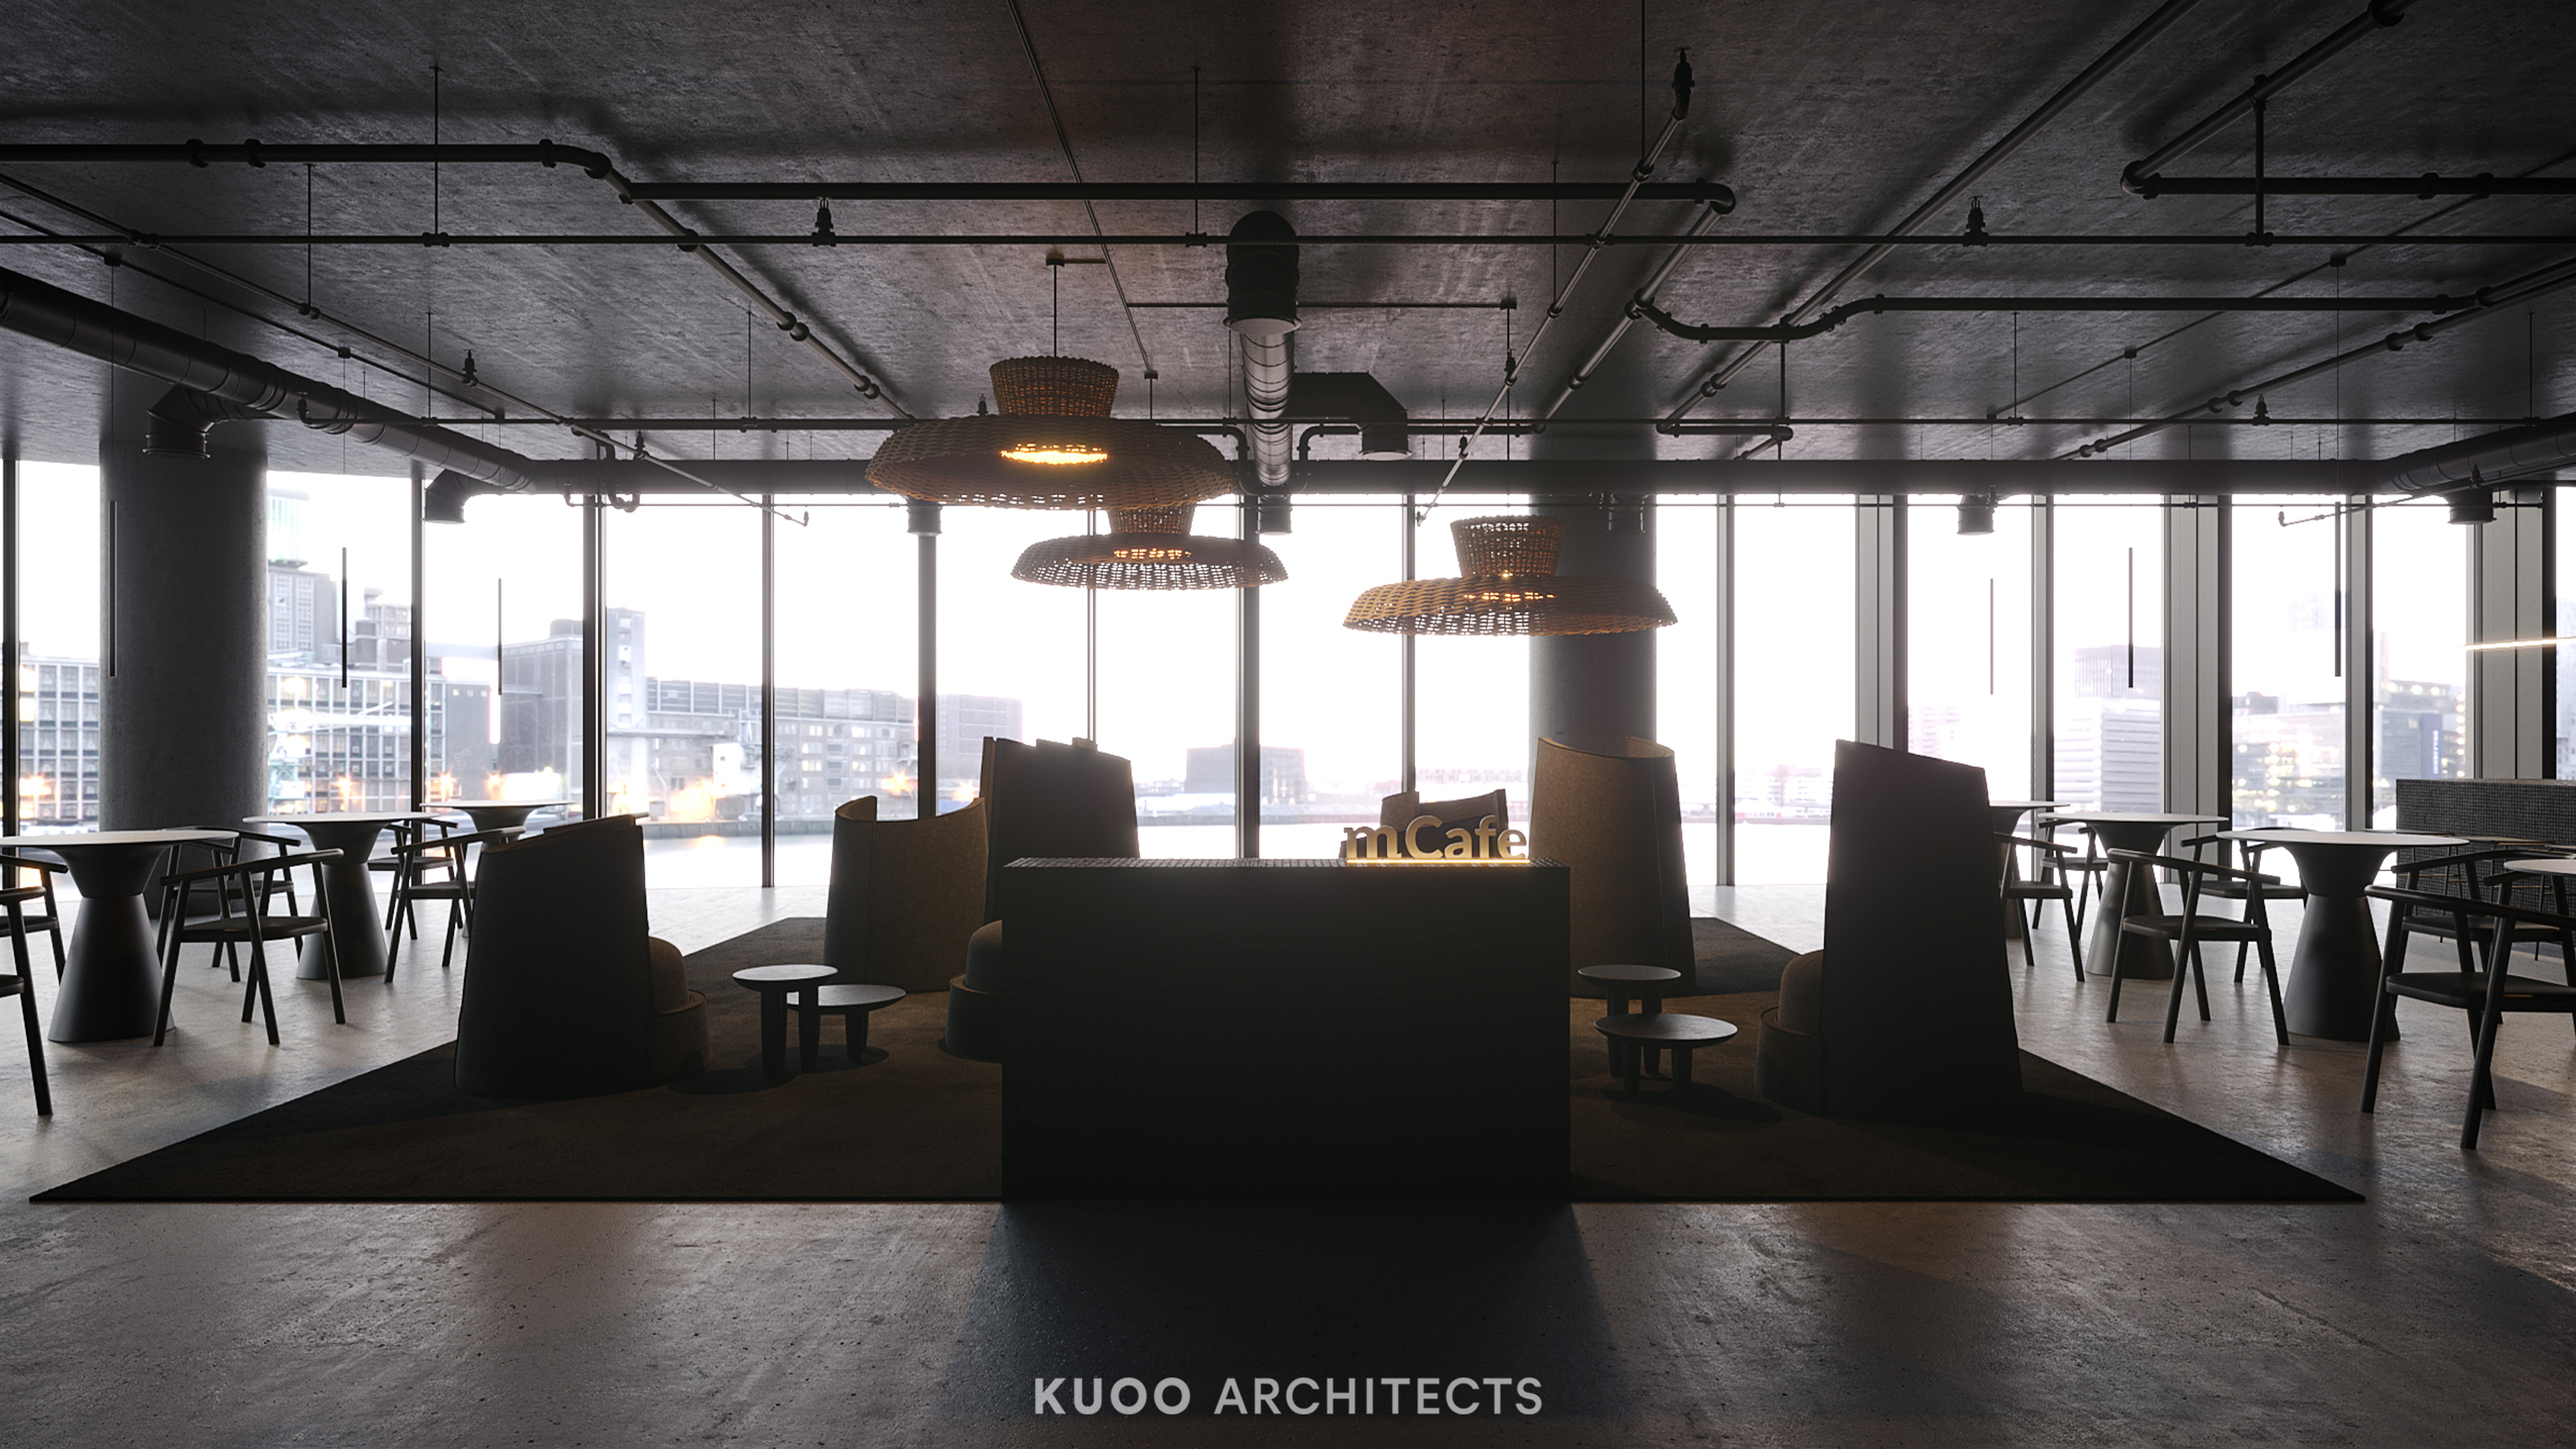 kuoo_architects_mcafe_7